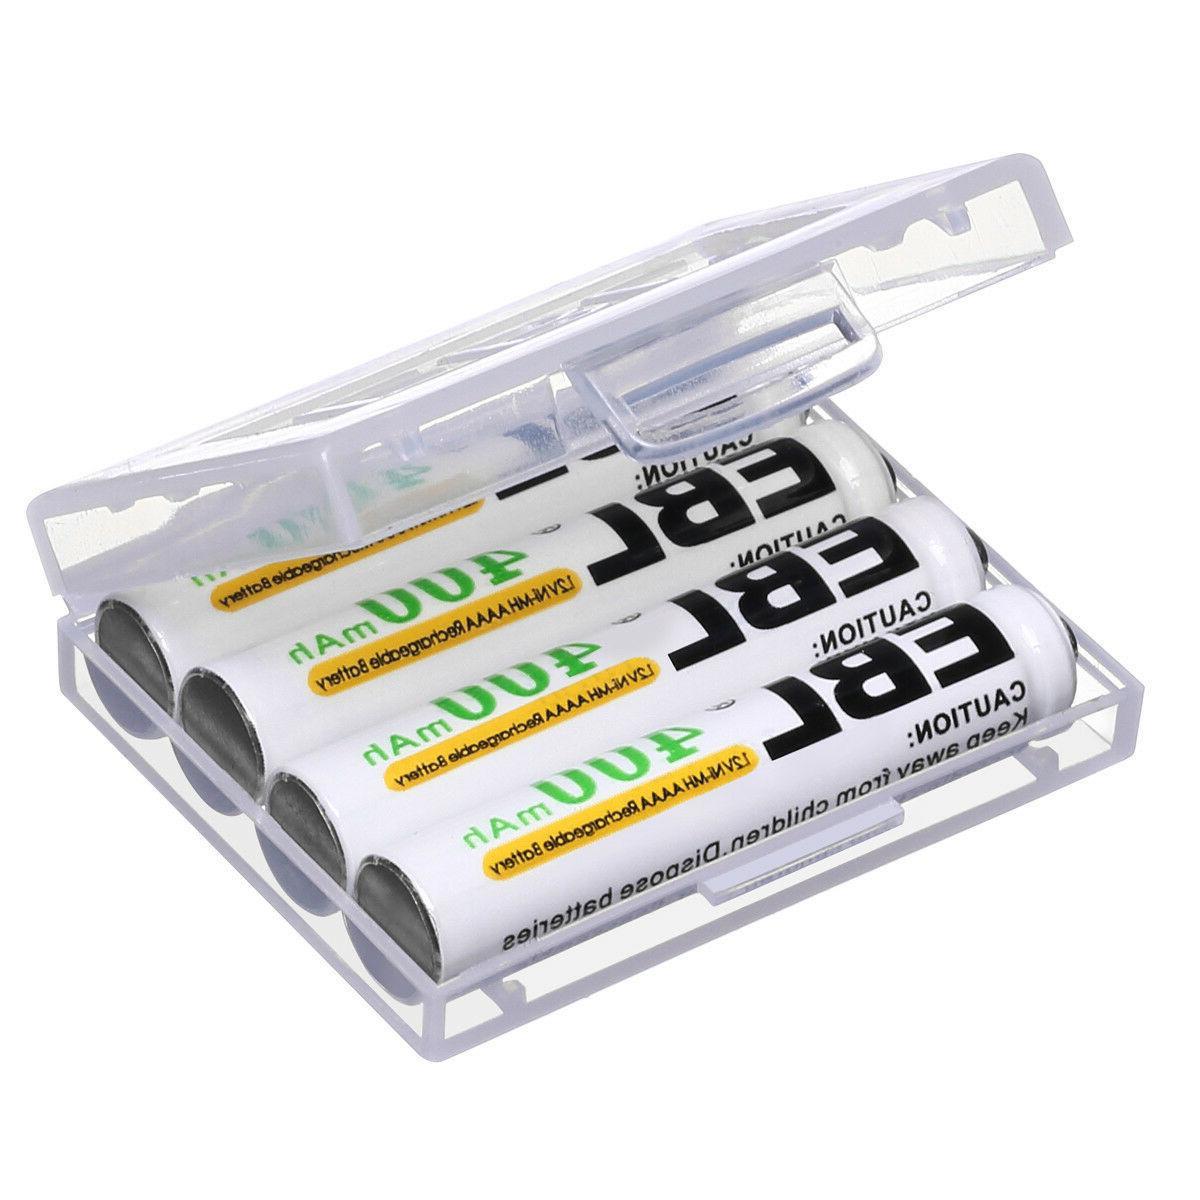 4x400mAh Ni-MH Rechargeable AAAA Pen